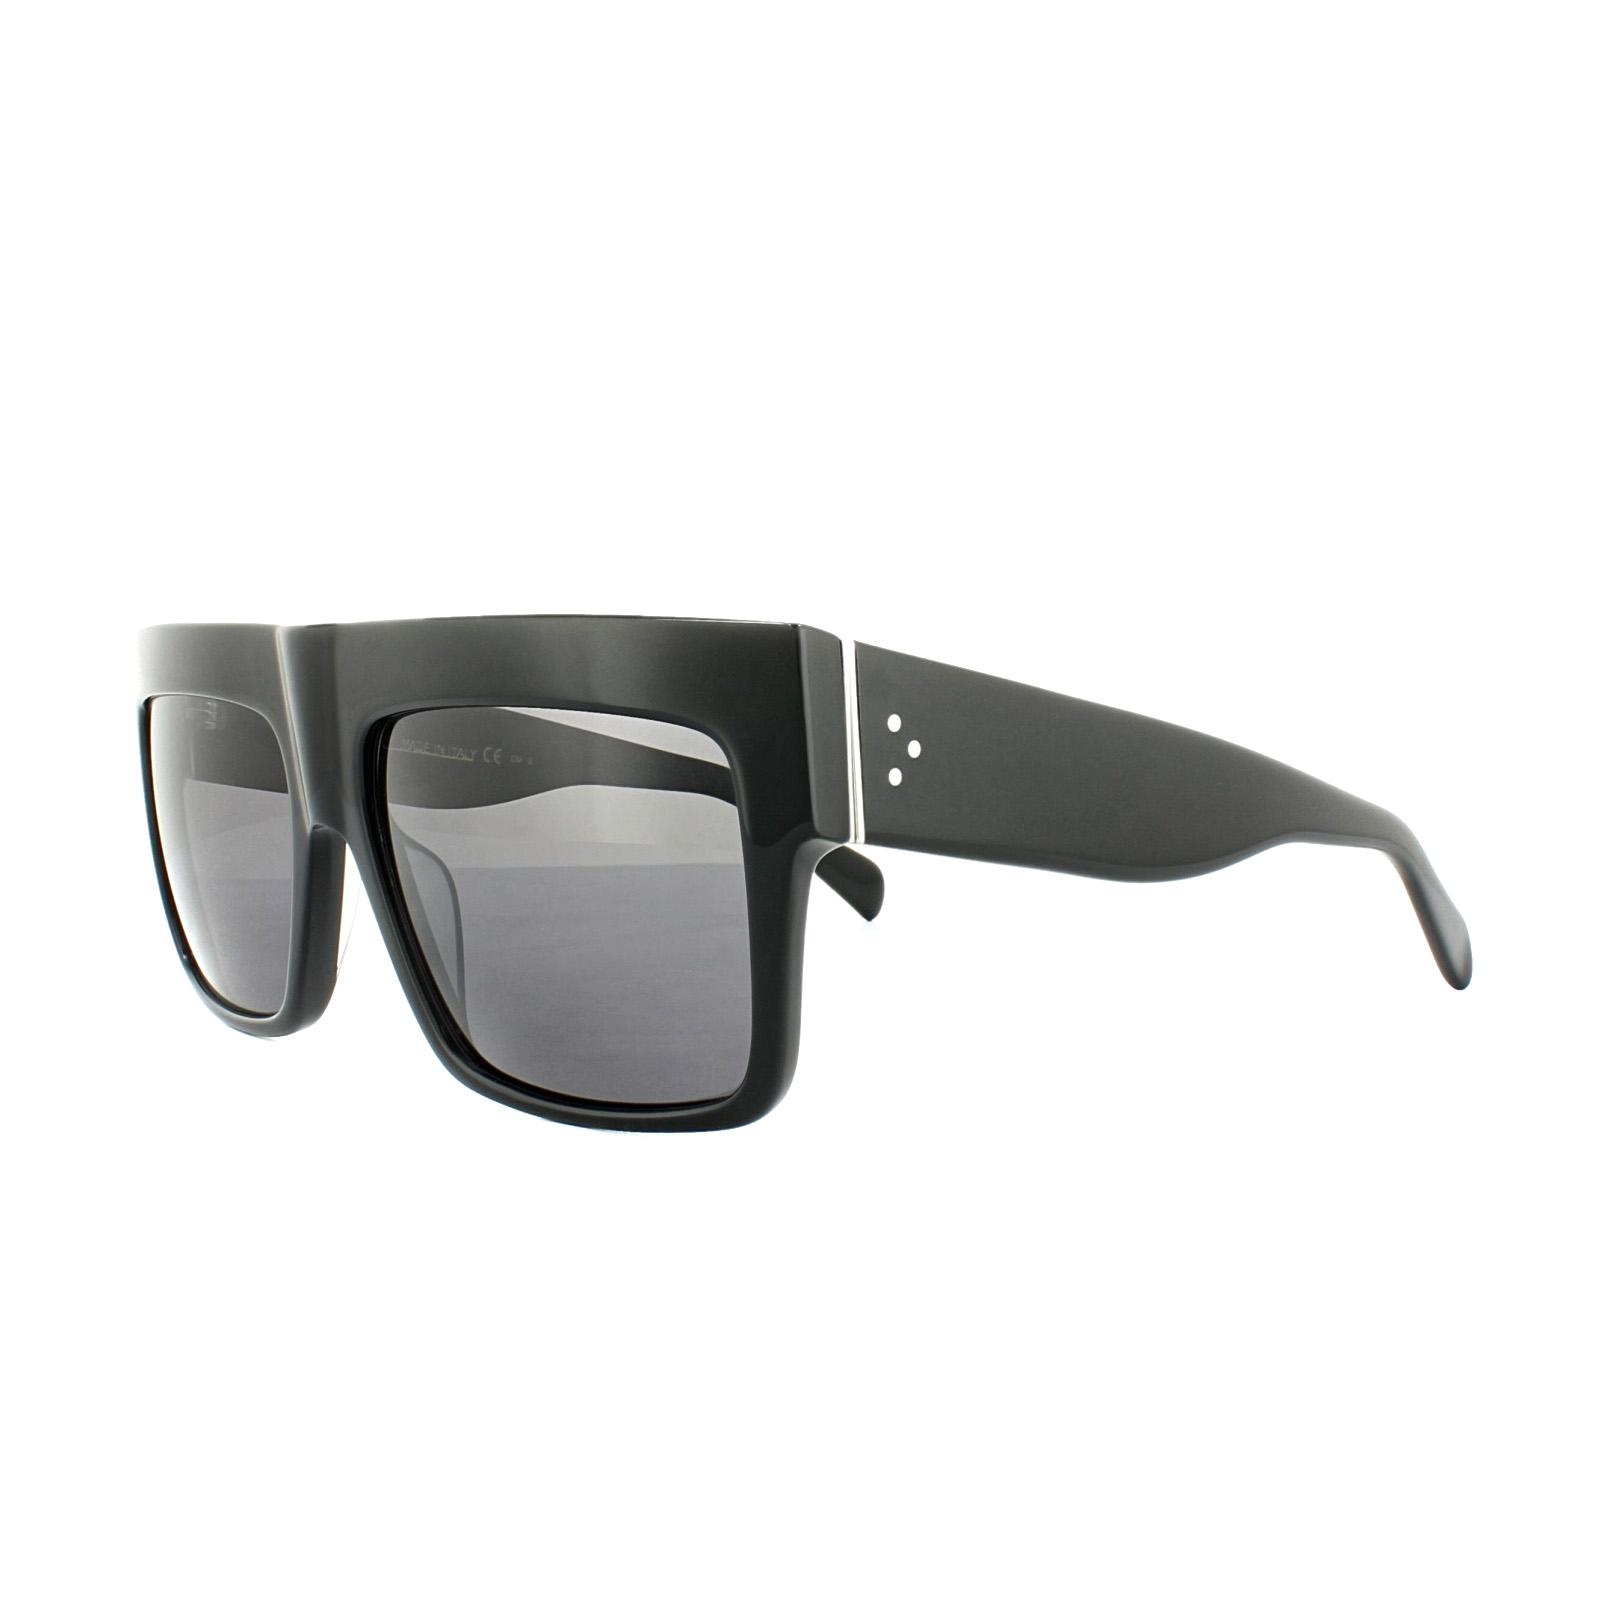 5f6a798c6423d Cheap Celine 41756 S ZZ Top Sunglasses - Discounted Sunglasses